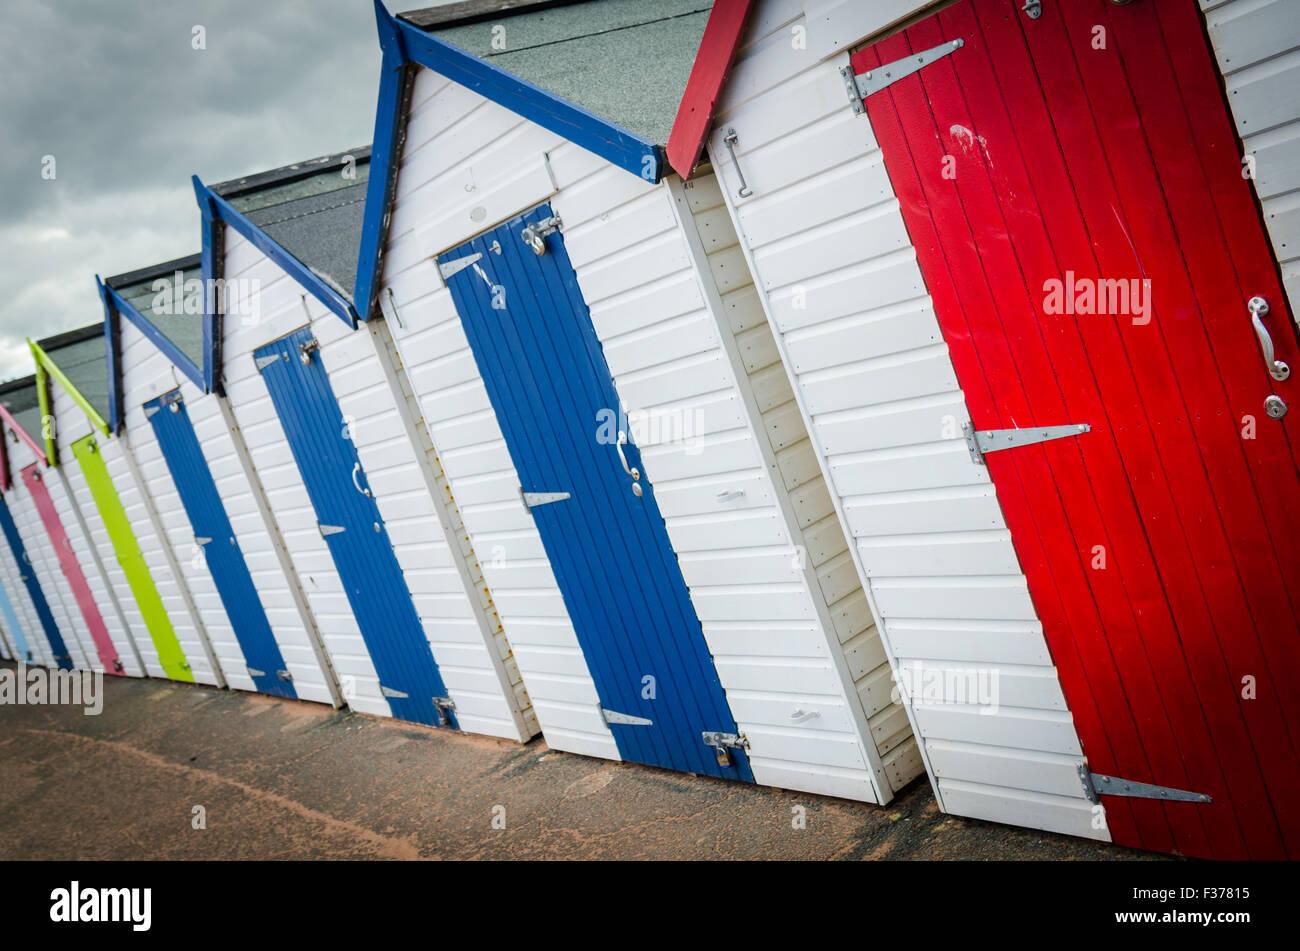 Beach Huts on Paignton Seafront - Stock Image